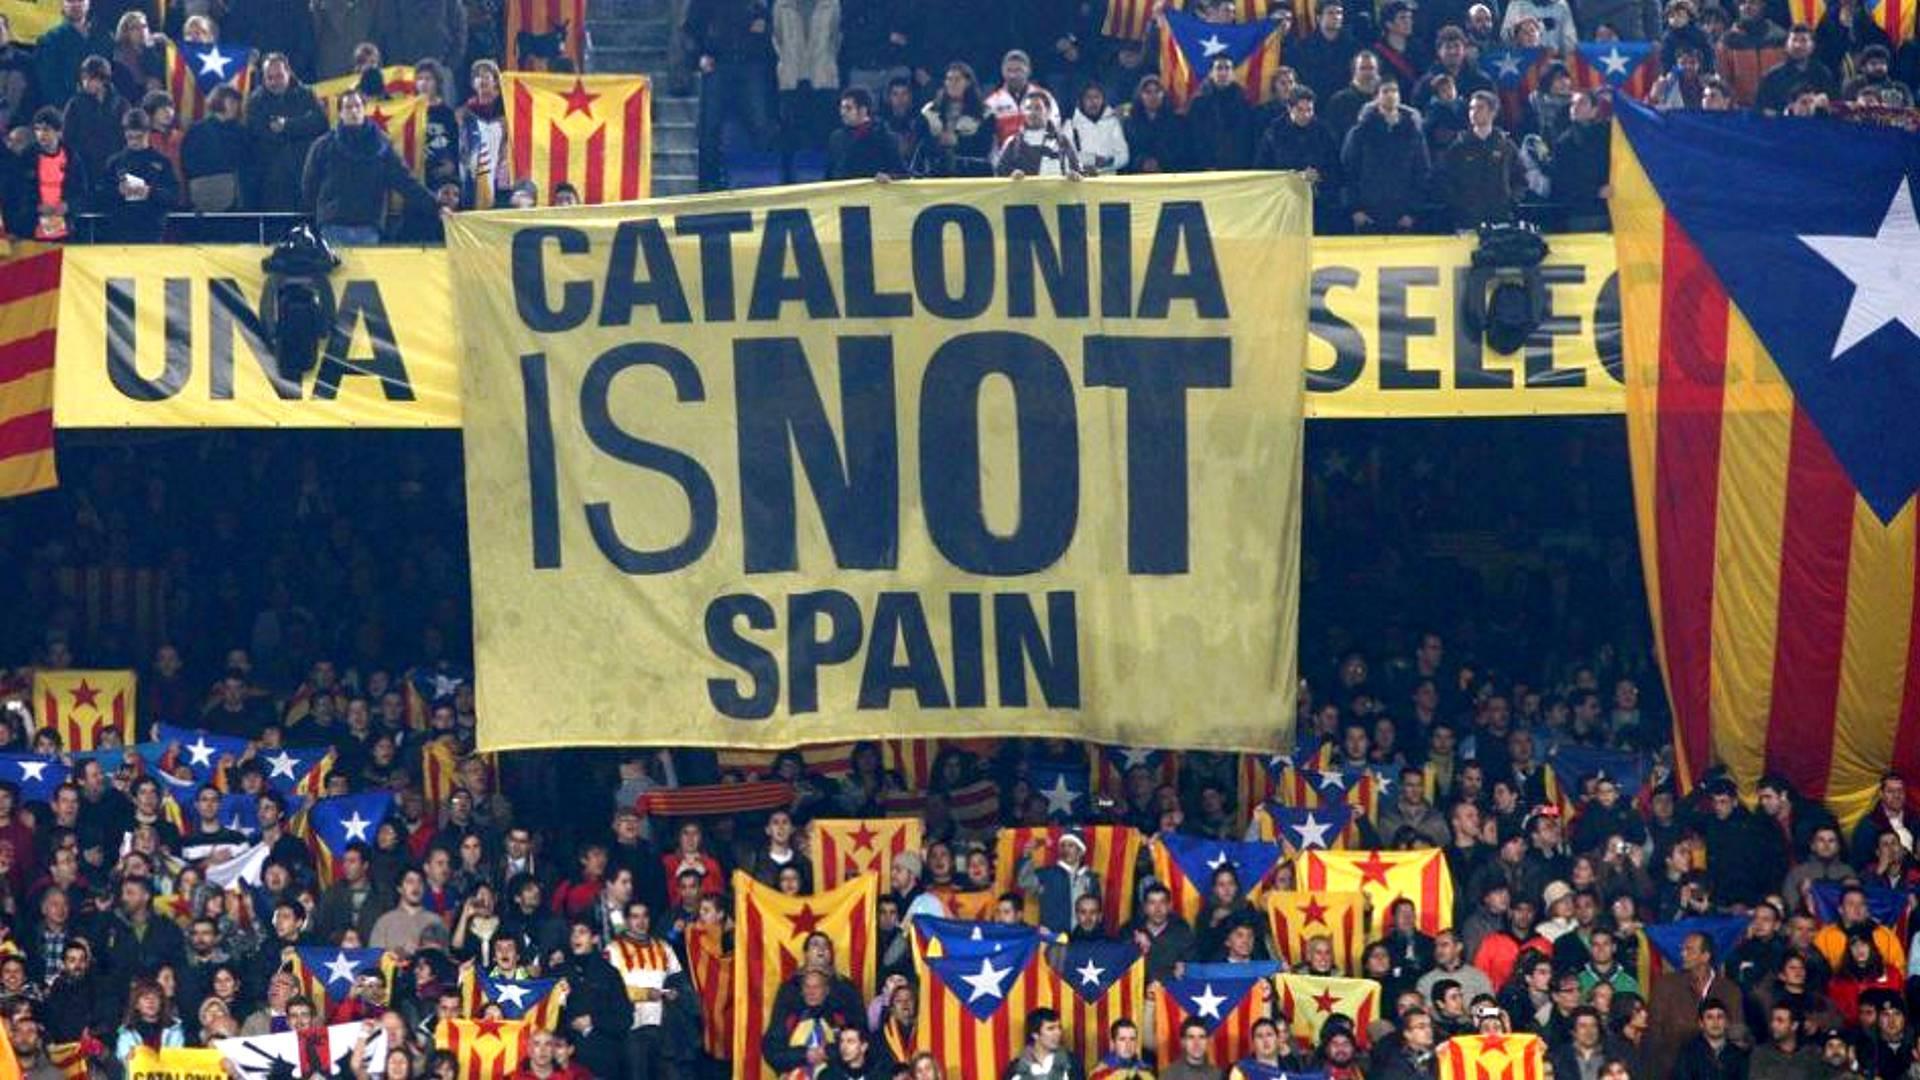 Catalan independence